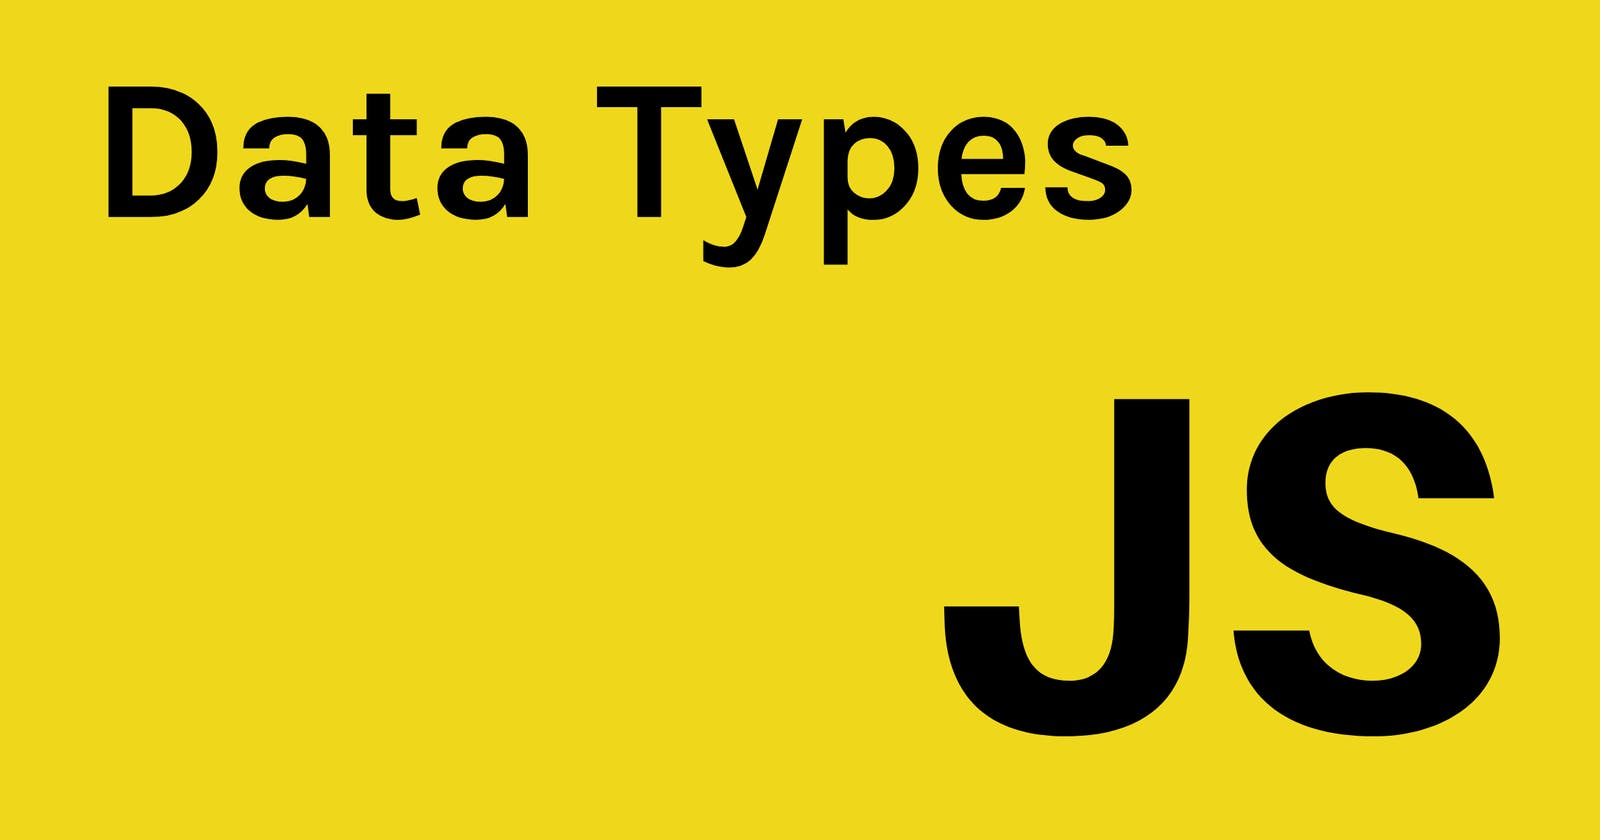 Basic JavaScript: Data Types